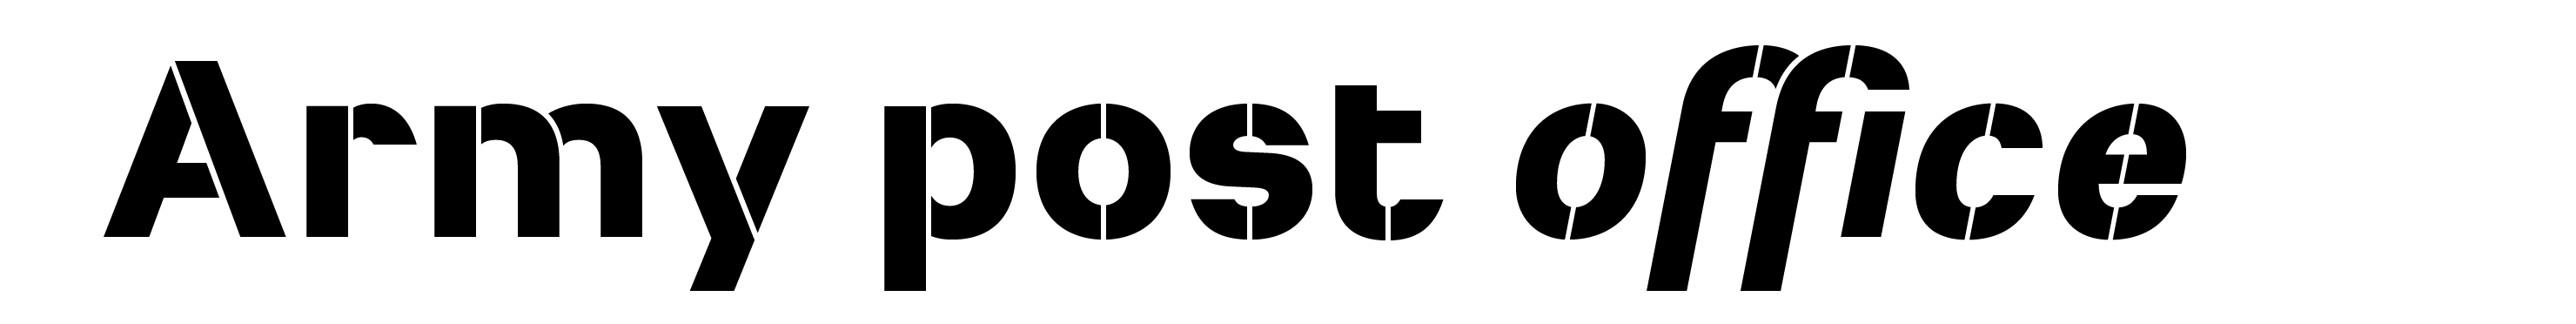 Typeface Heimat Stencil D012 Atlas Font Foundry